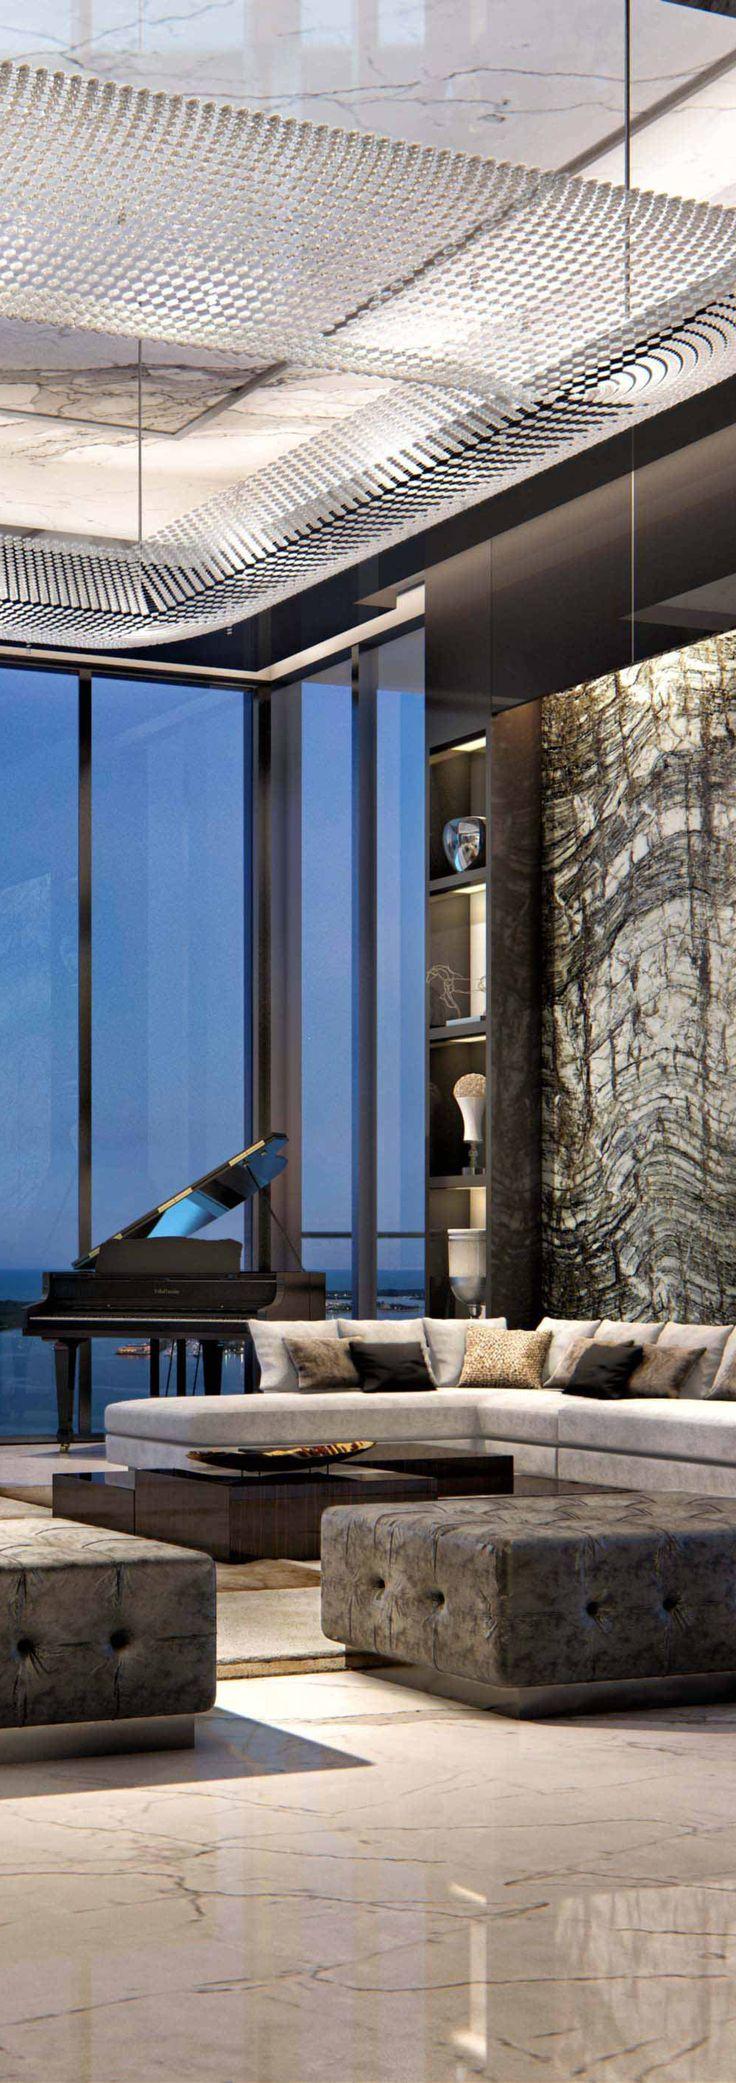 261 best glamorous homes images on pinterest living room designs penthouse living room luxury livingluxury lifestylepenthousesrooftopluxury homesinterior